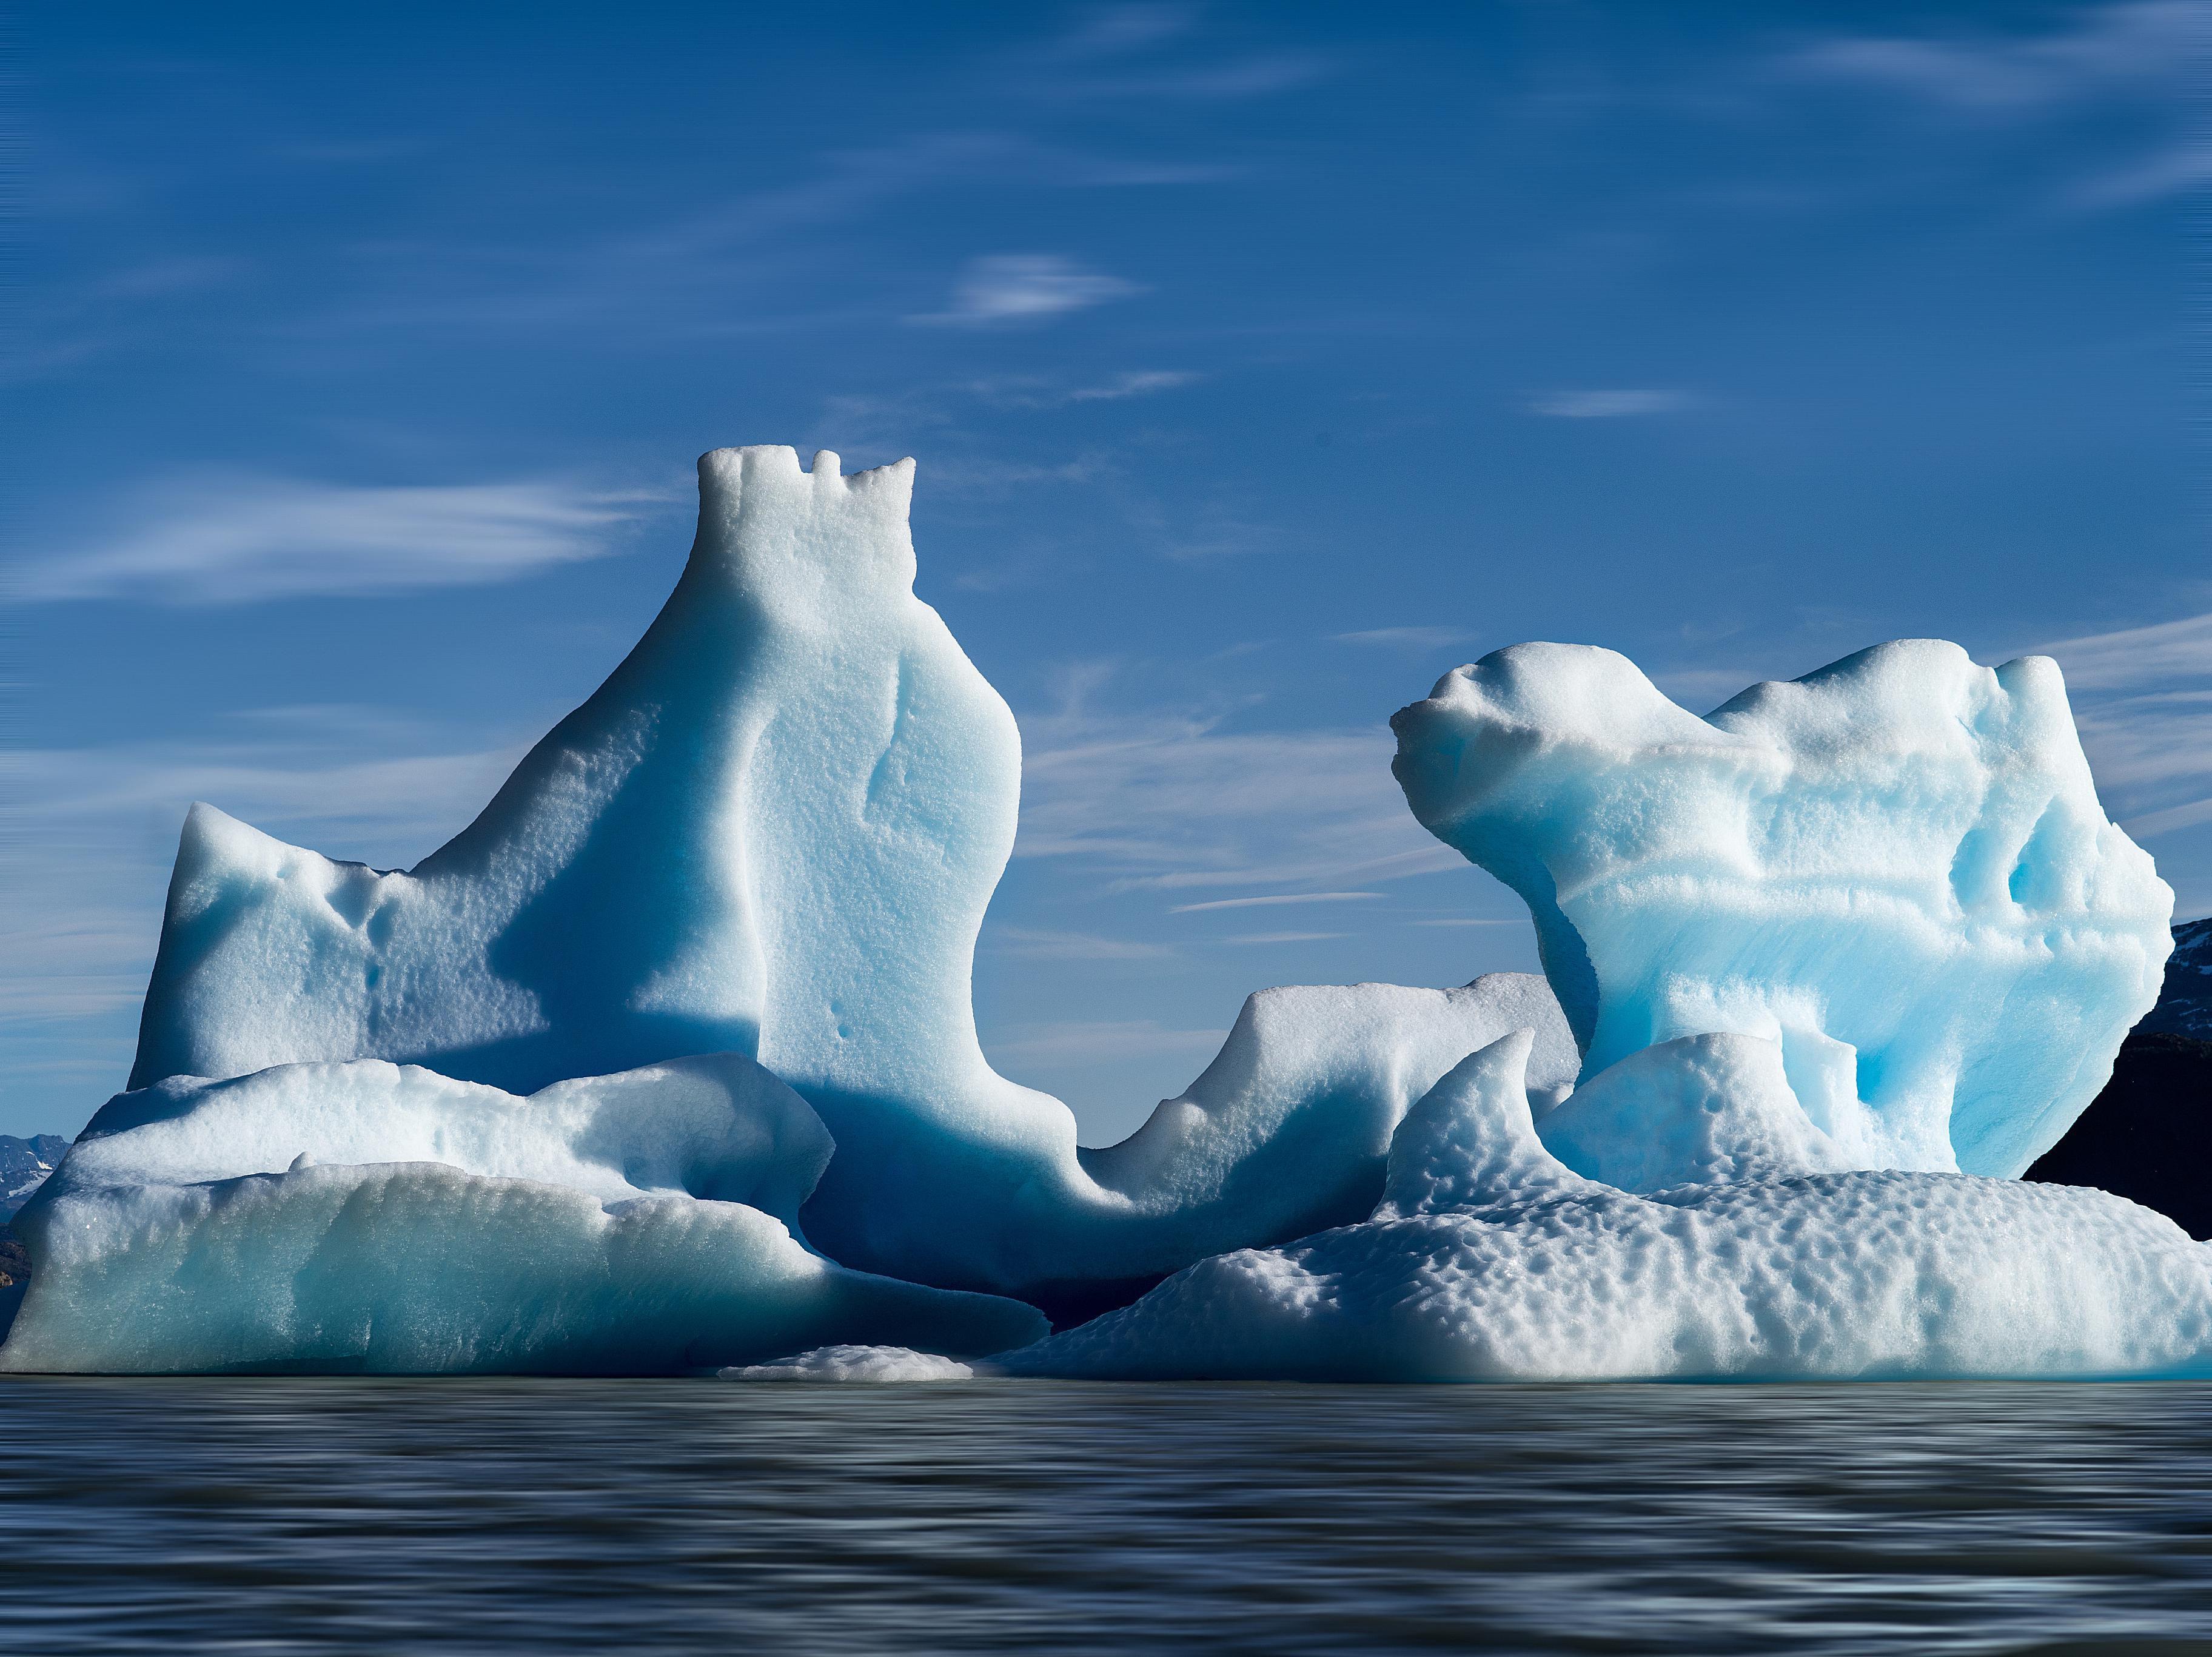 Homemade Iceberg Experiment